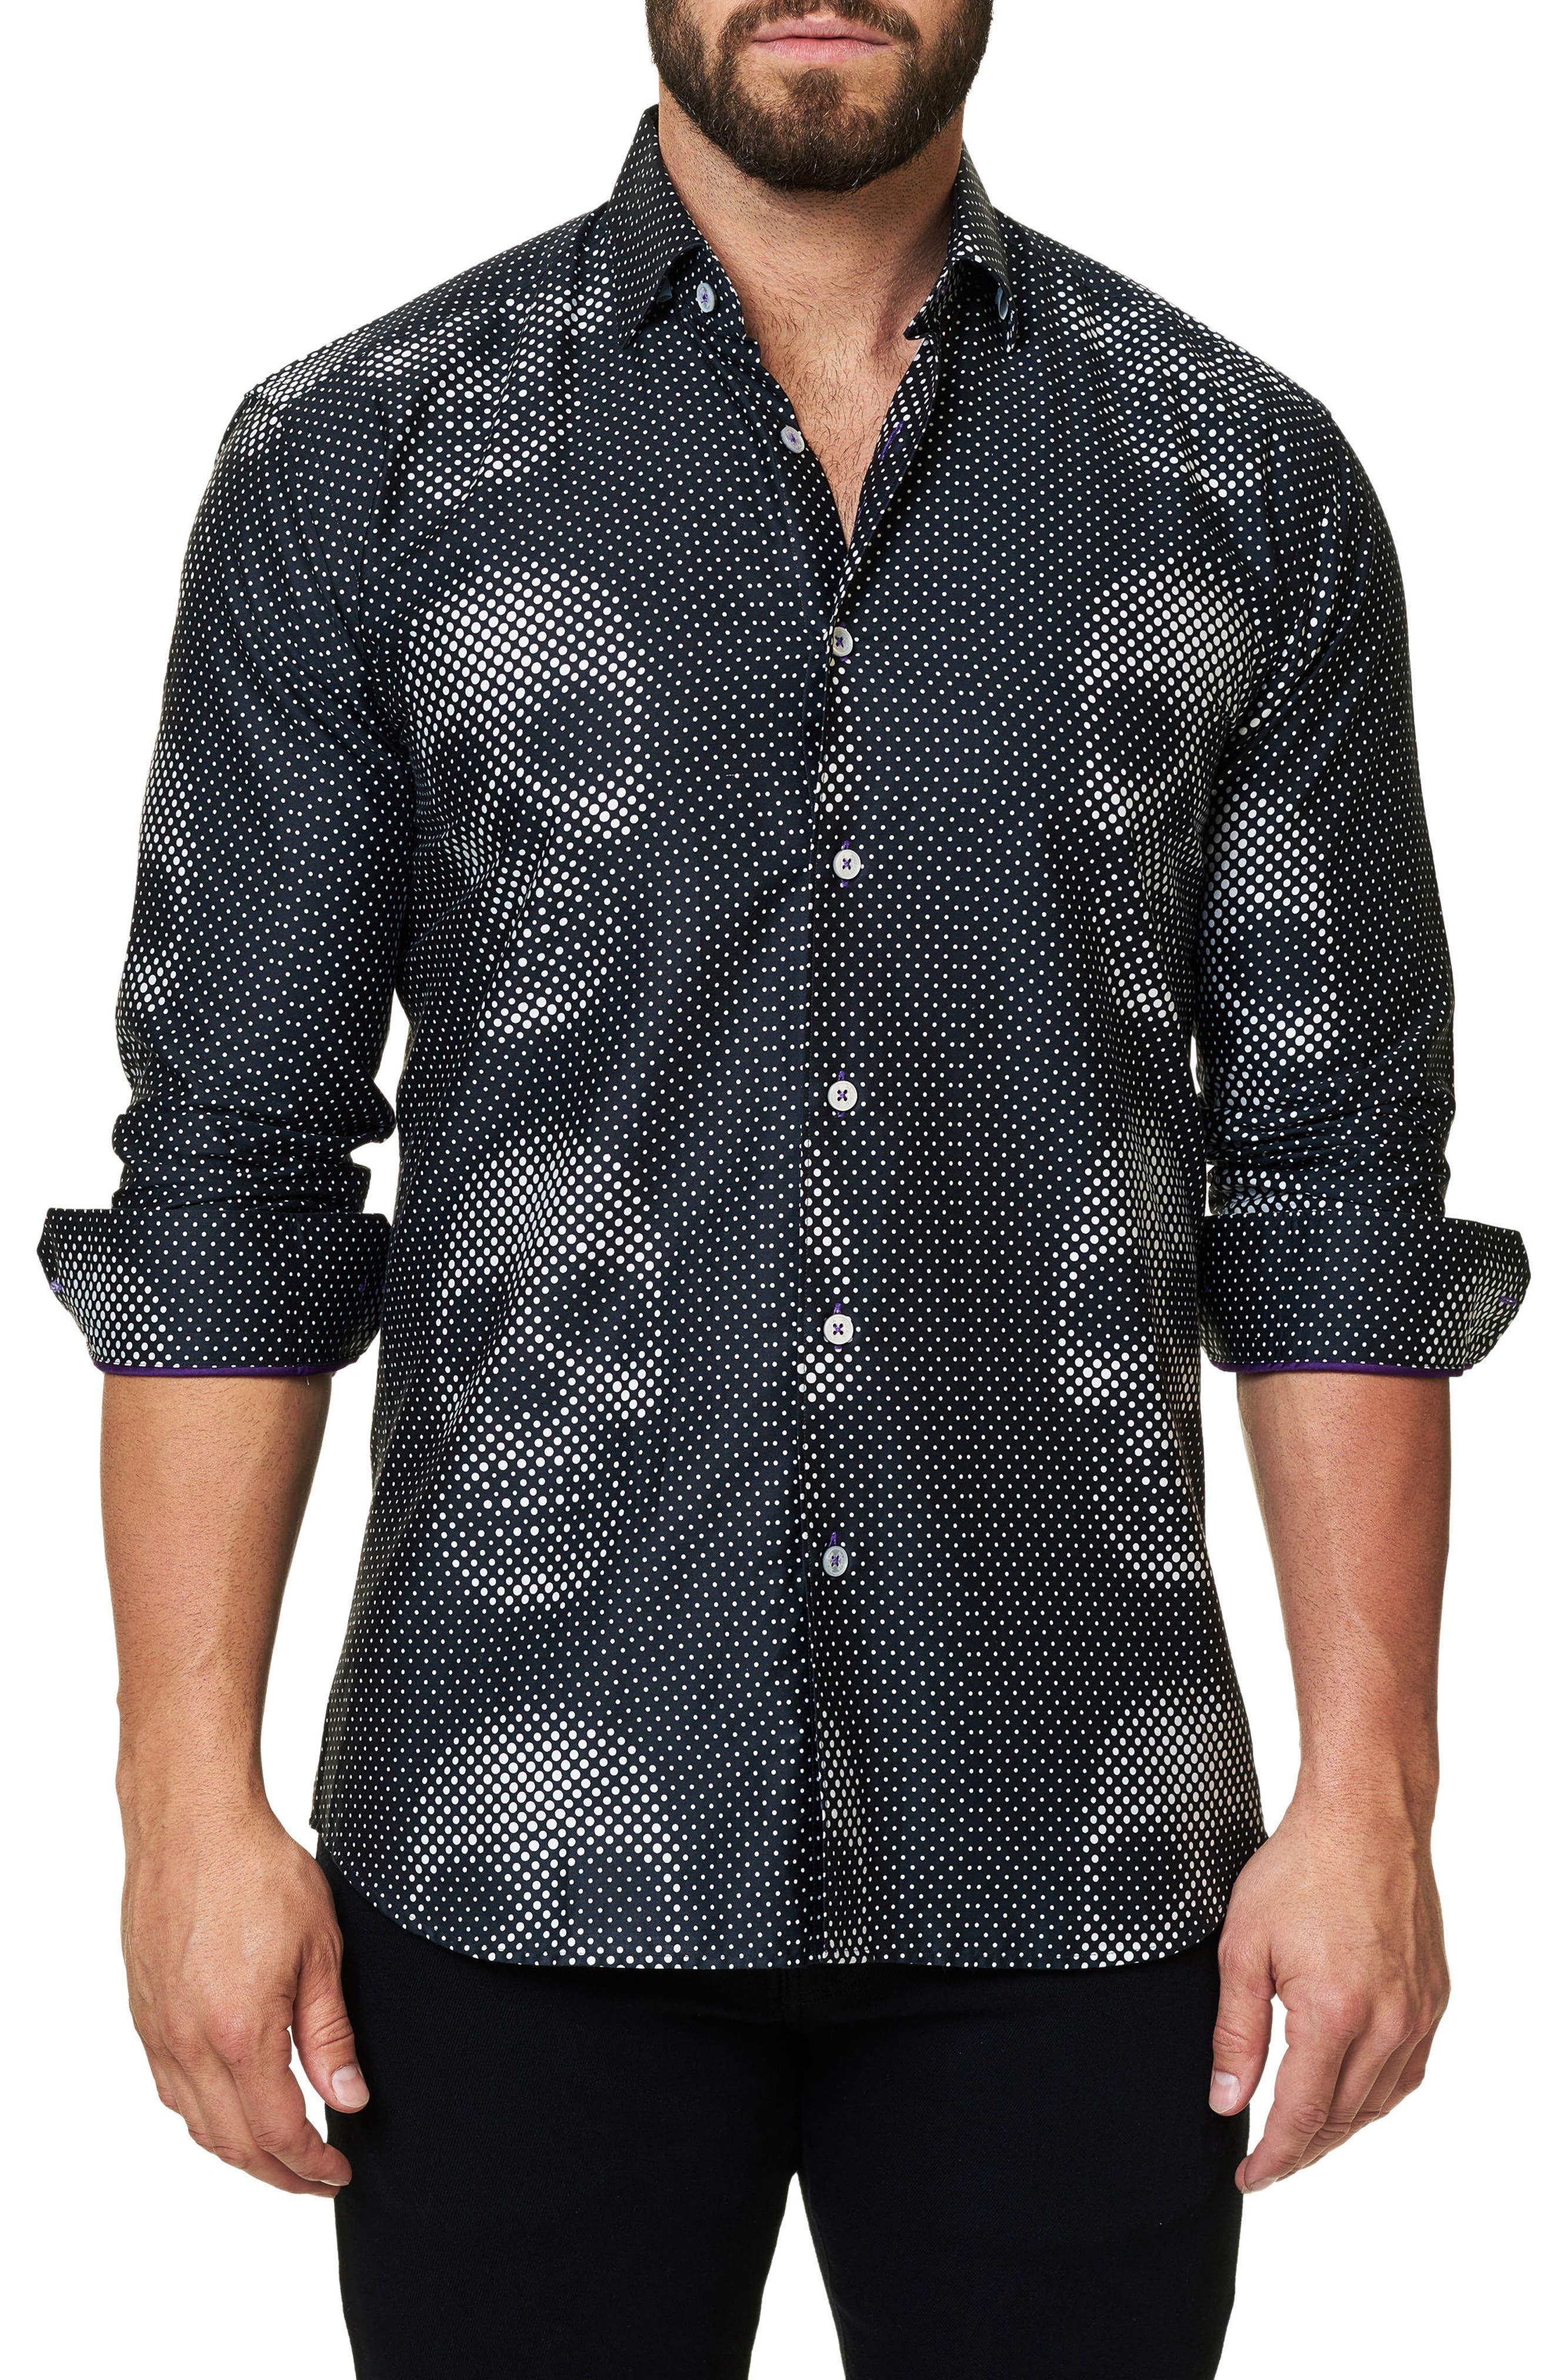 Maceoo Luxor Funky Skull Slim Fit Sport Shirt